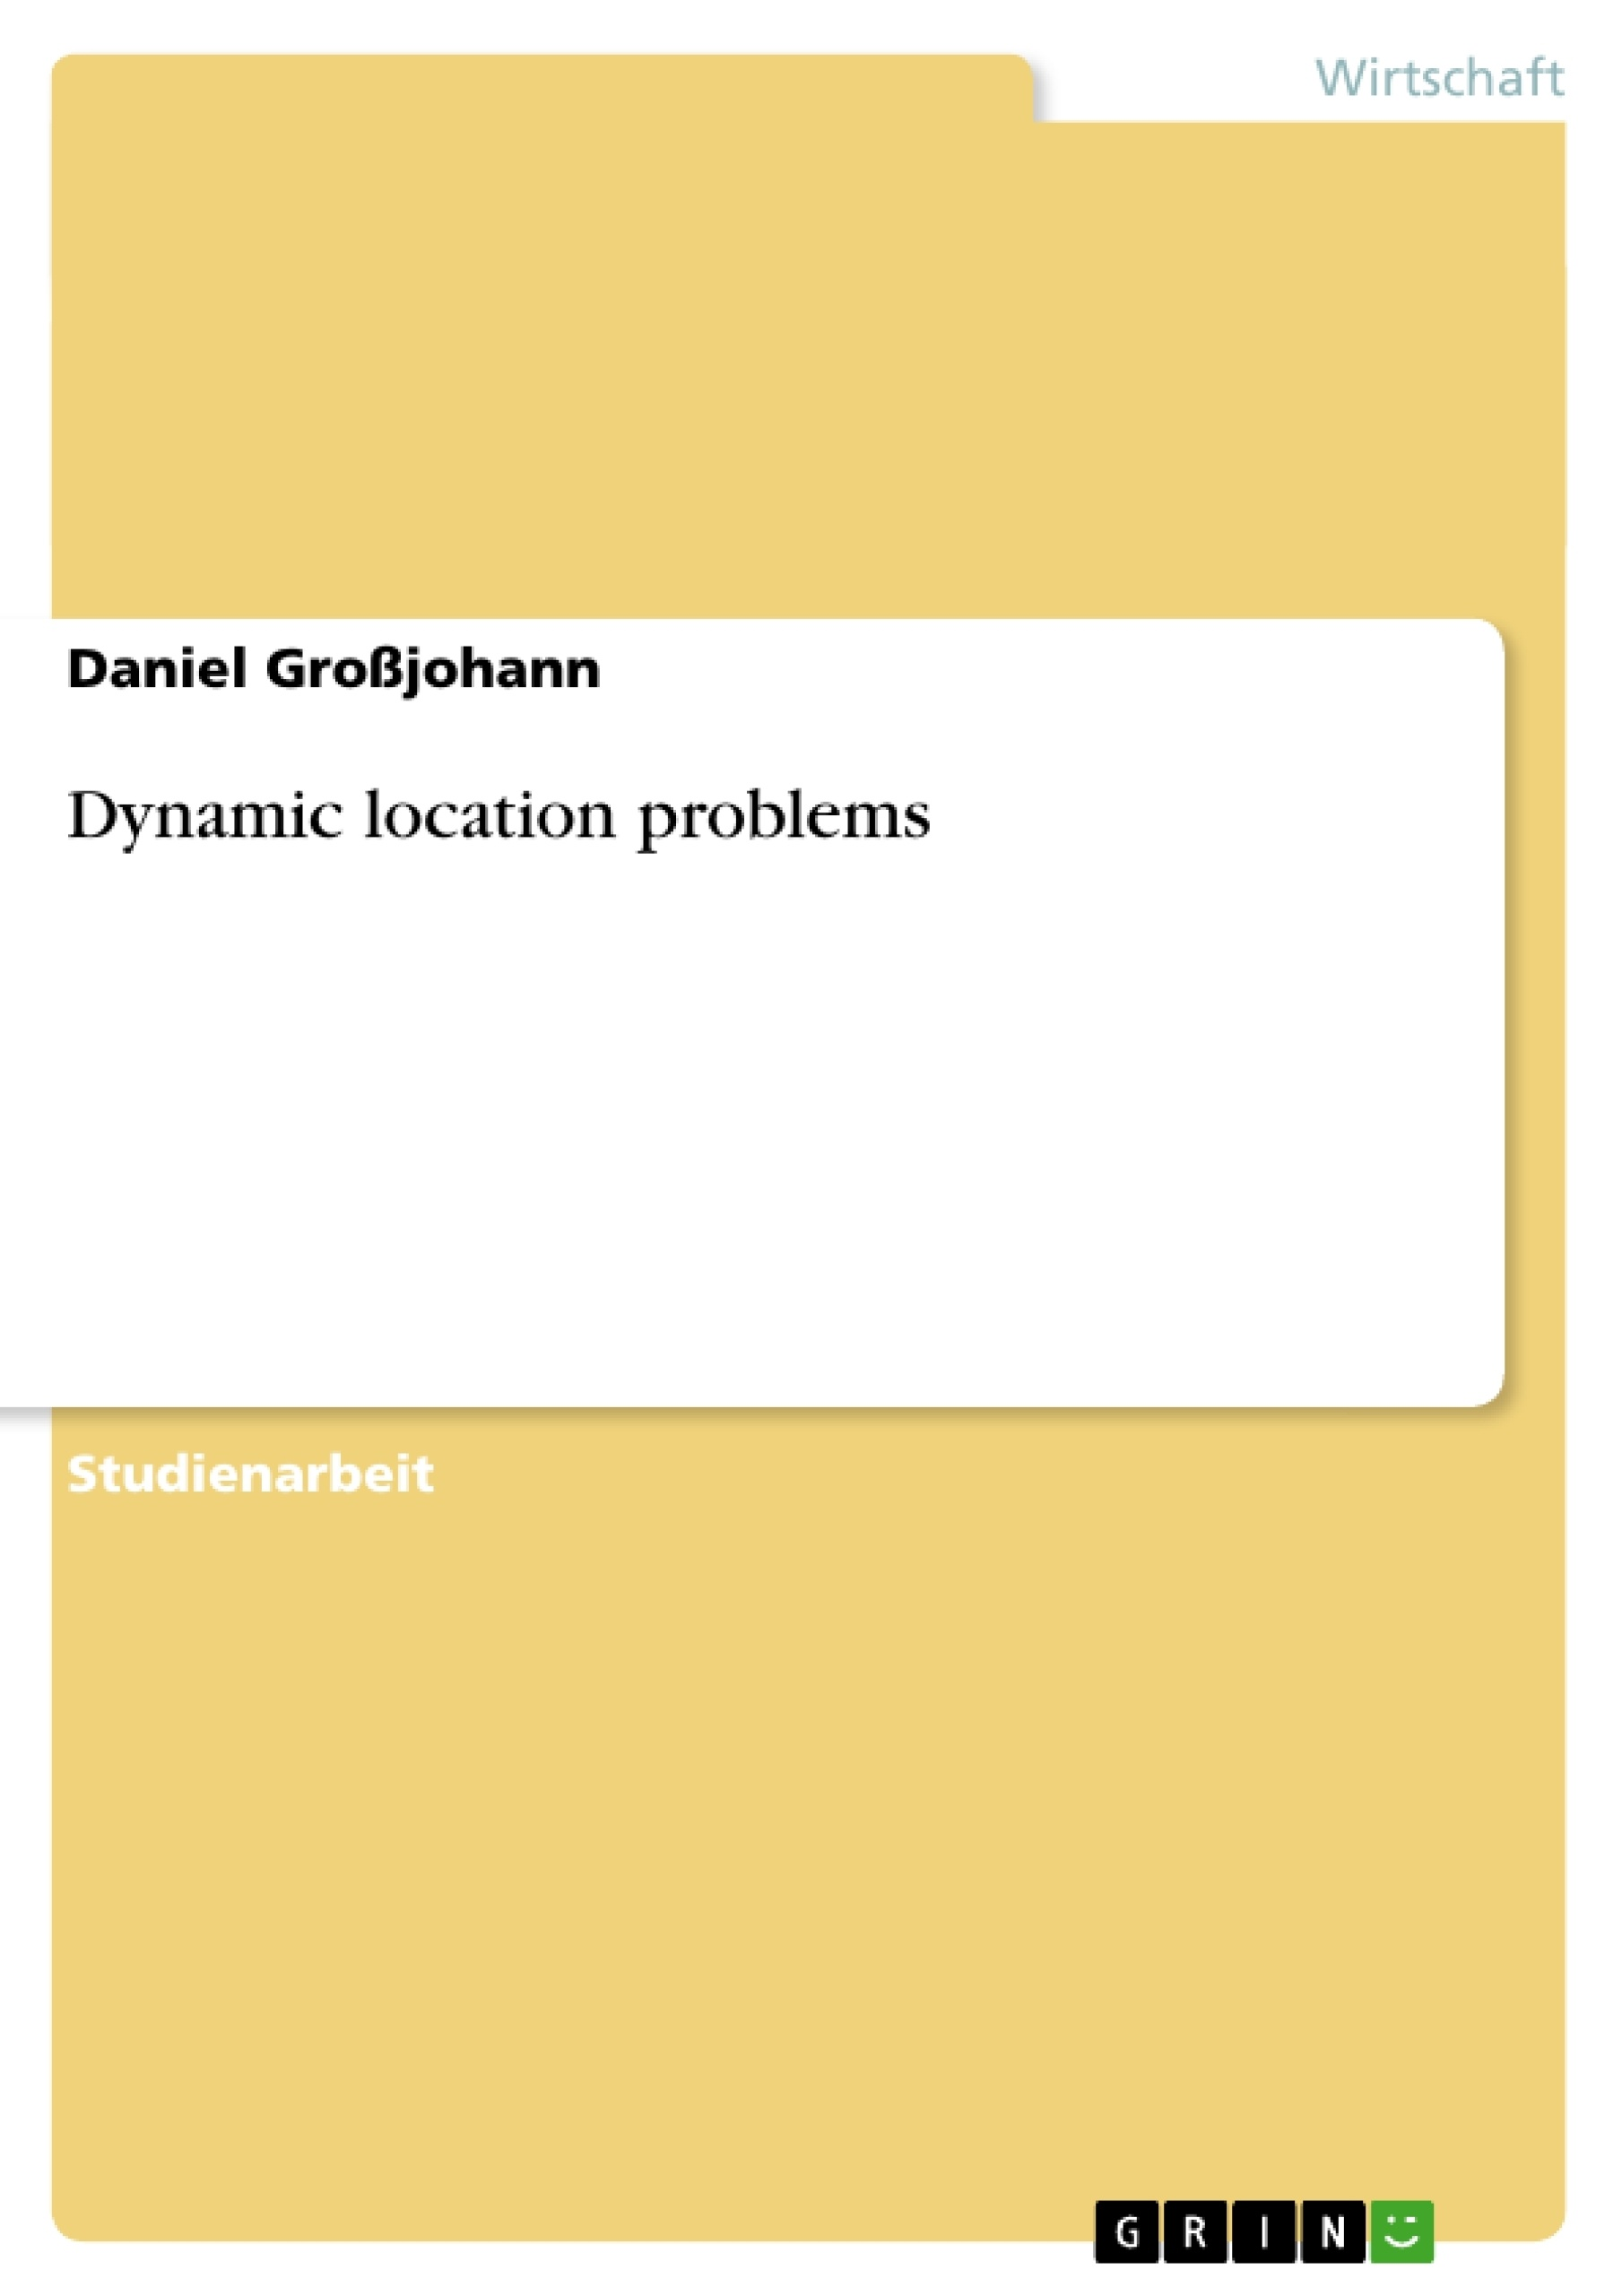 Titel: Dynamic location problems